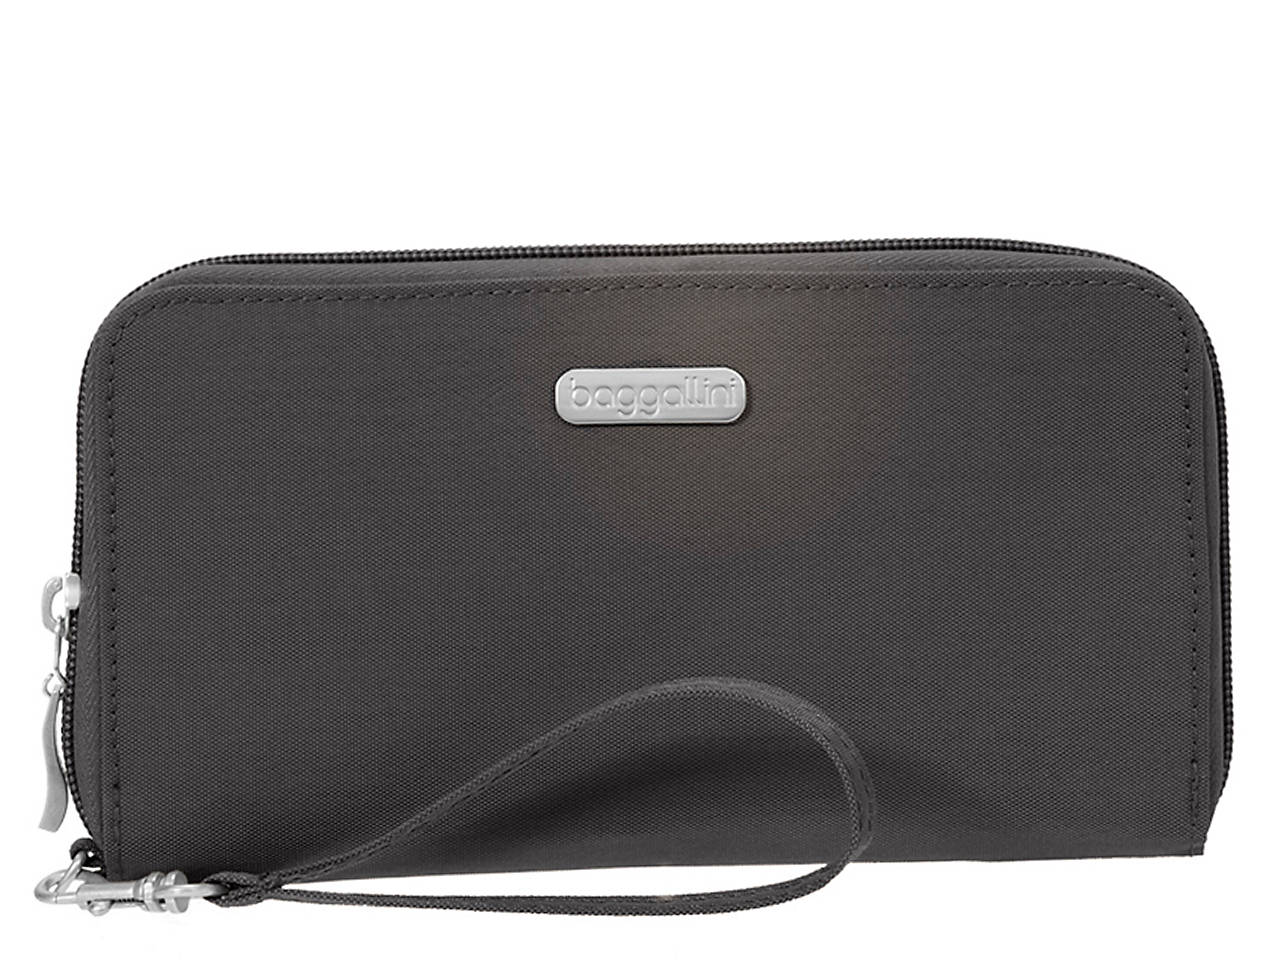 5346ee8c2bc781 Baggallini Continental Wristlet Women's Handbags & Accessories   DSW